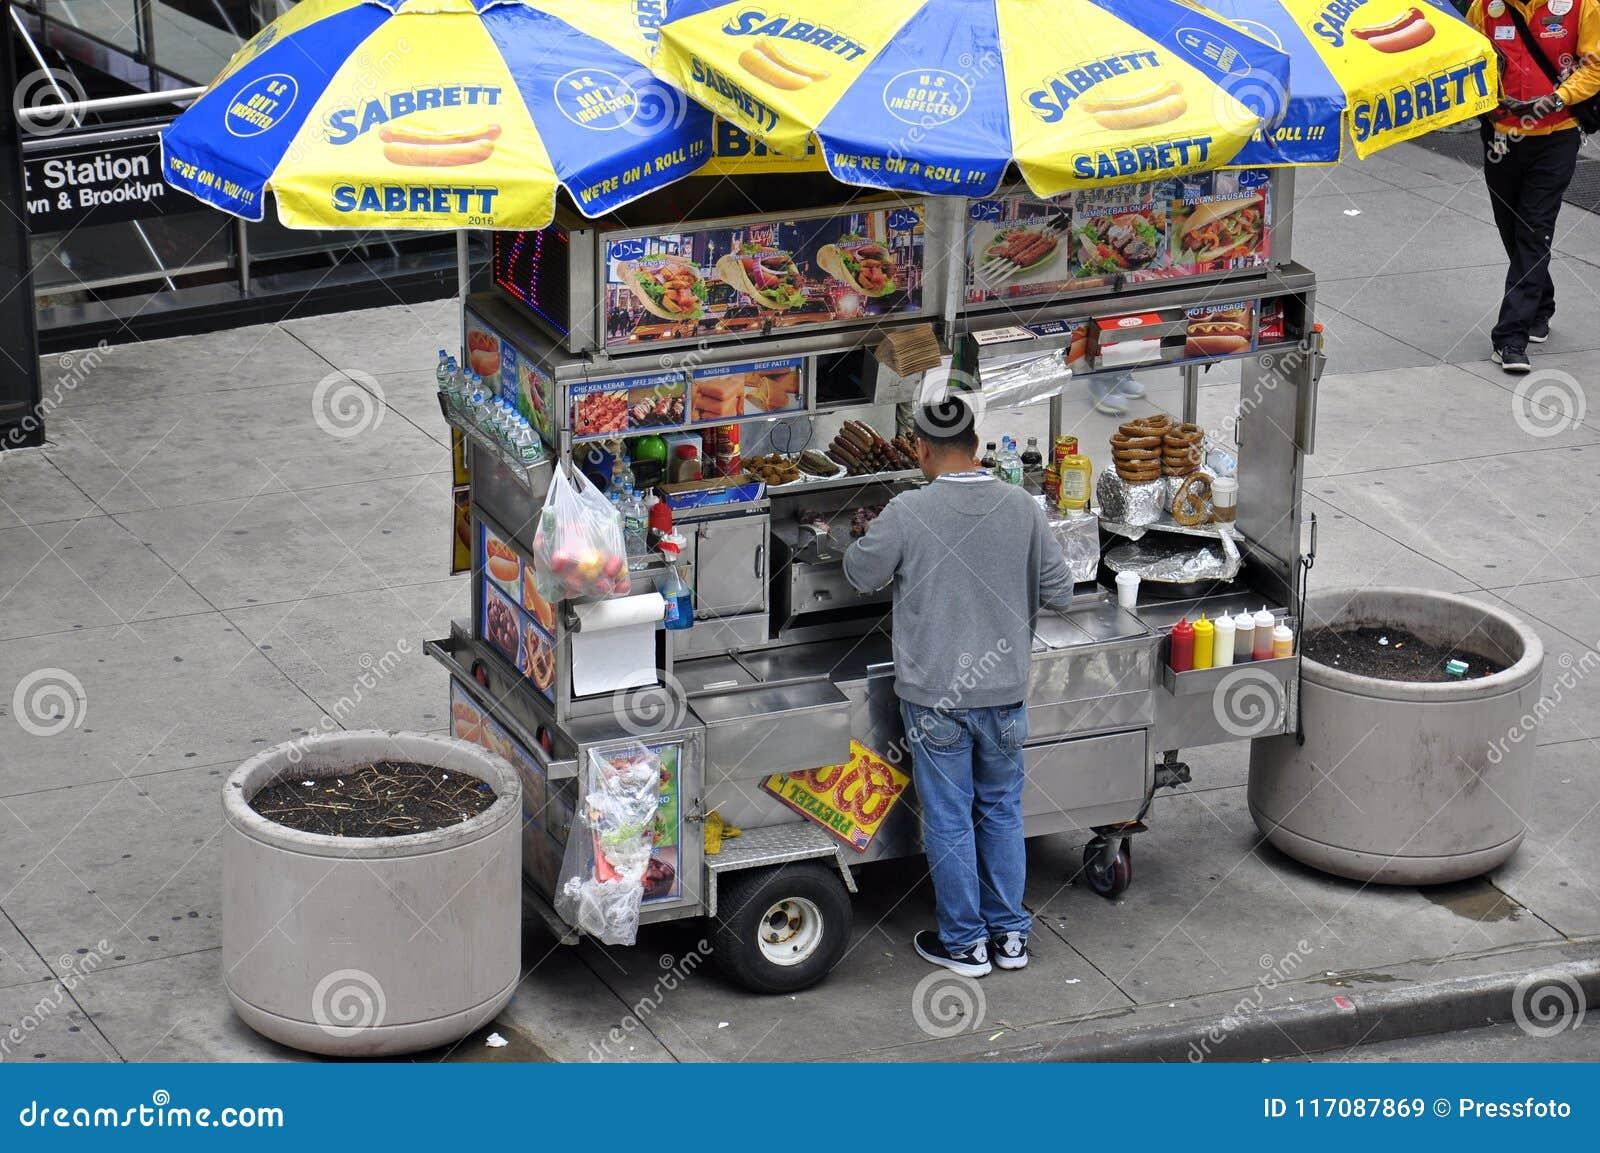 Hot Dog Kiosk In New York City, USA Editorial Stock Image